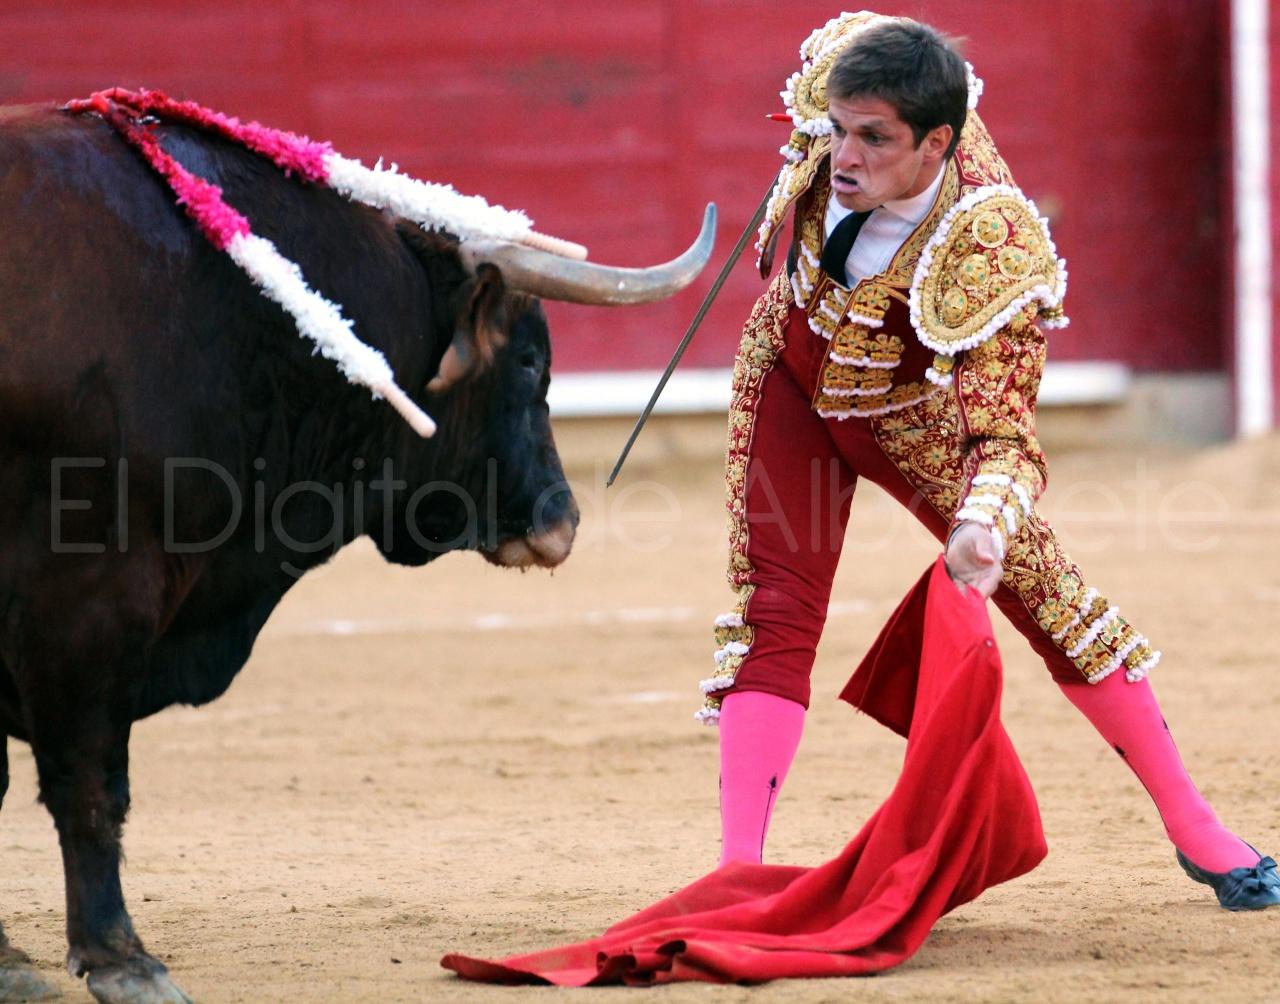 El Juli Lopez Simon y Garrido Feria Albacete 2015 toros  101